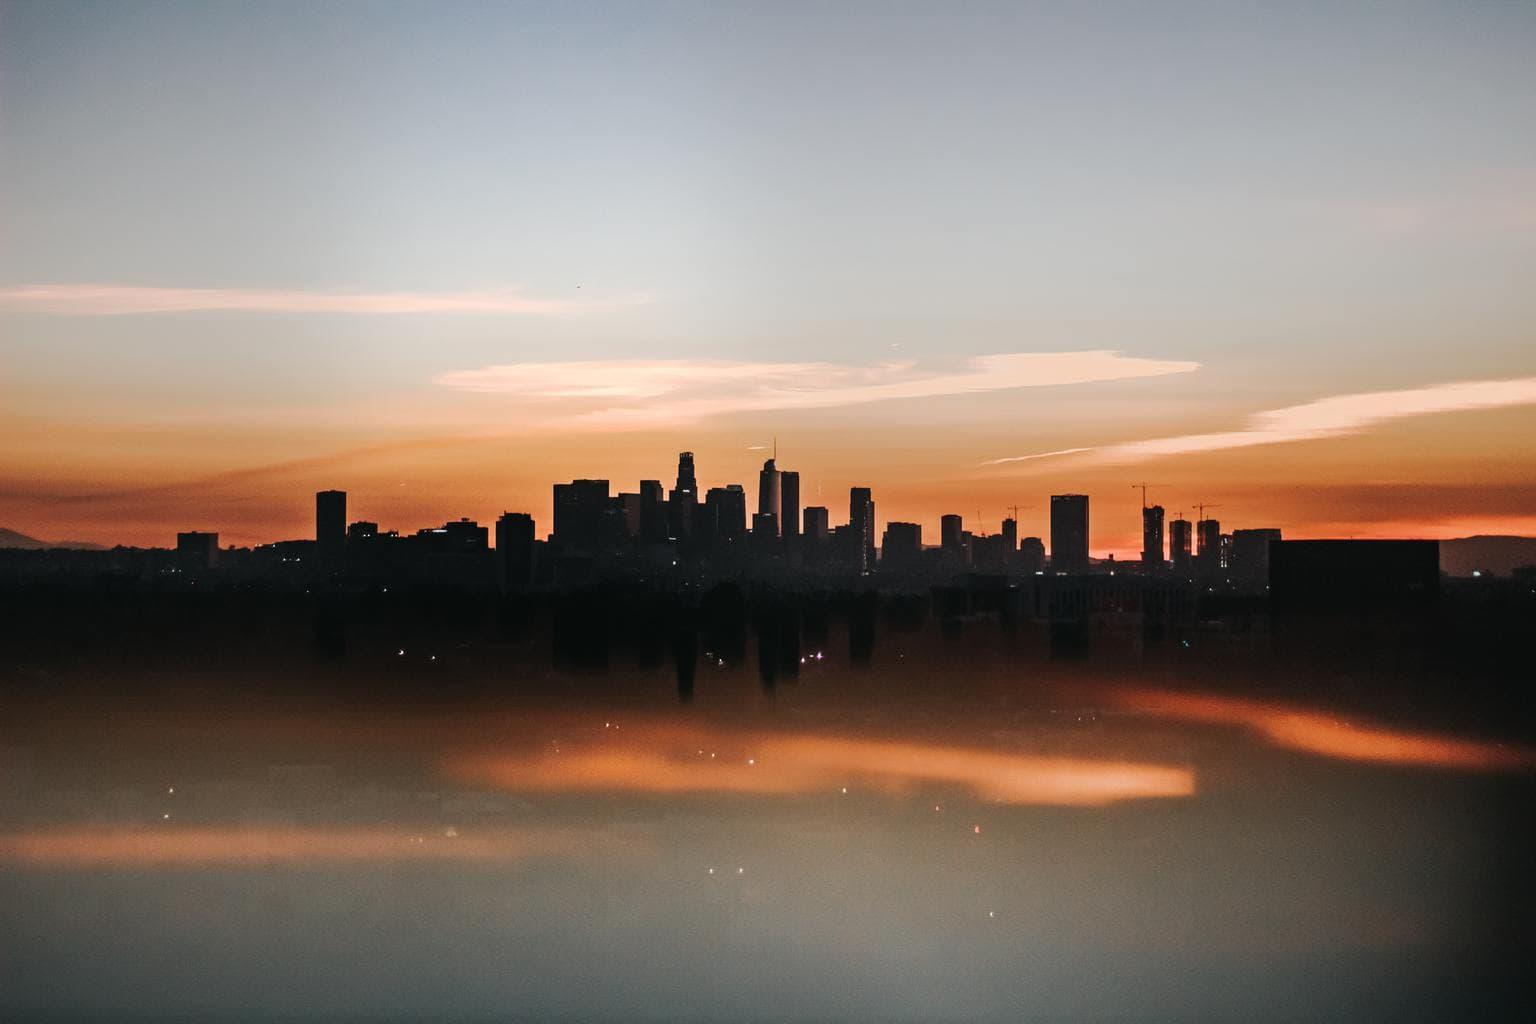 paisaje urbano amanecer skyline